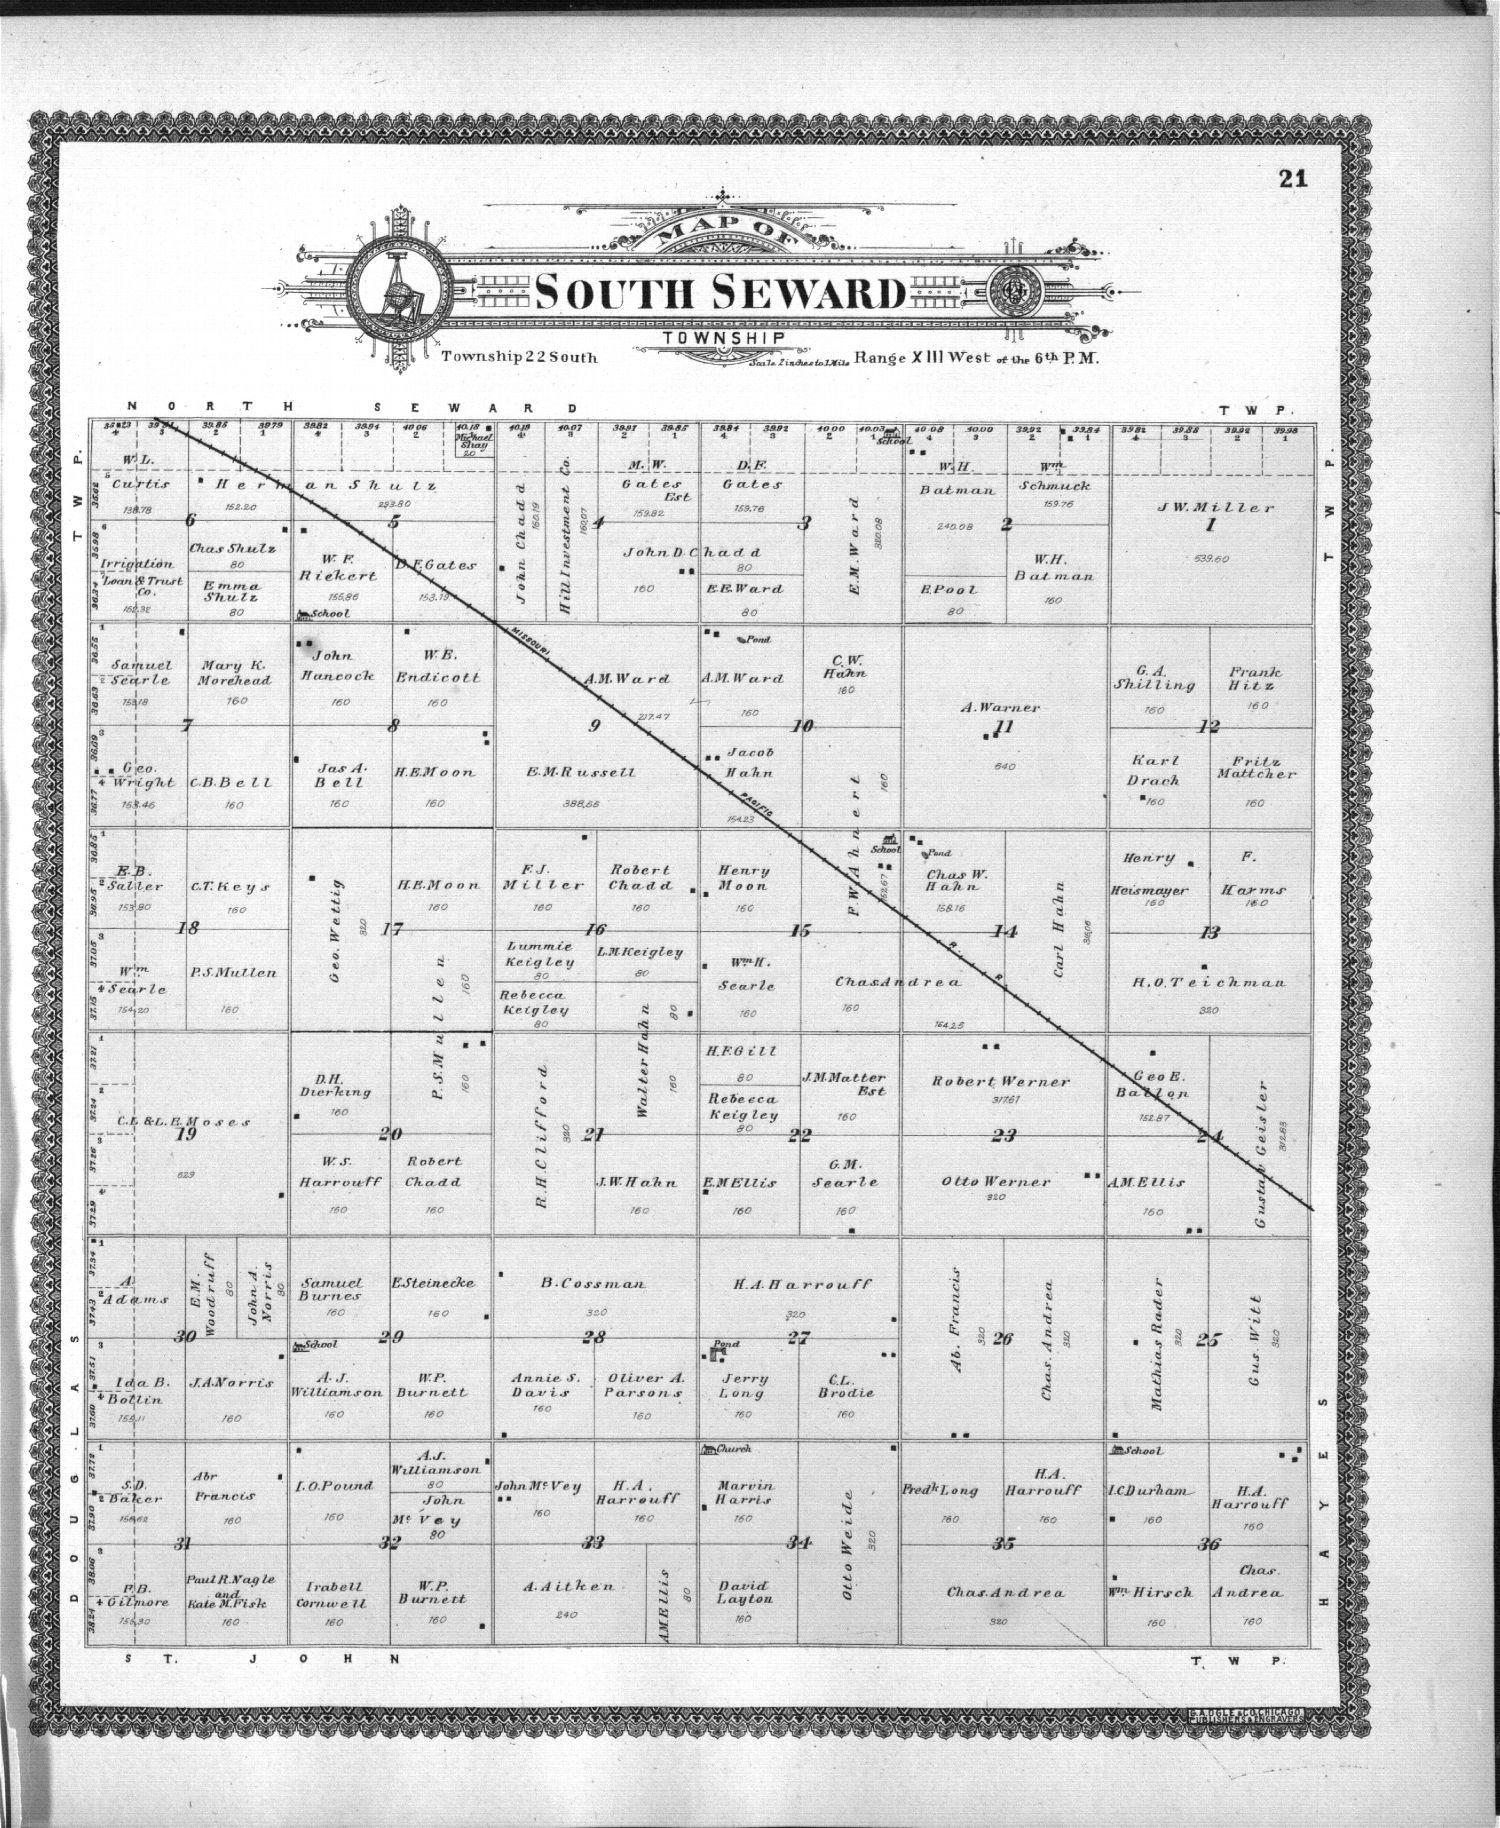 Standard atlas of Stafford County, Kansas - 21